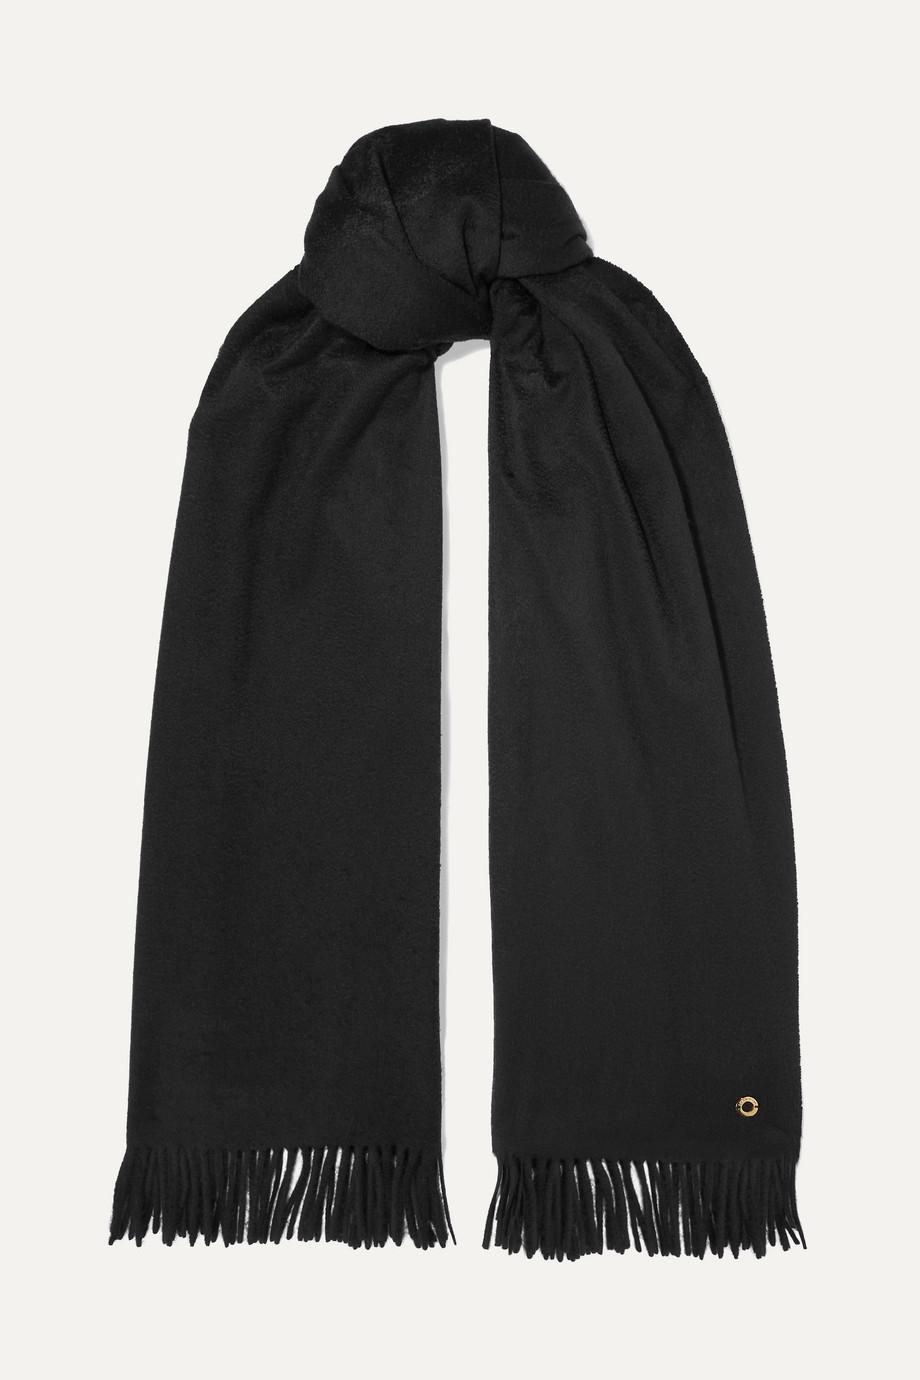 Loro Piana Opera fringed cashmere scarf